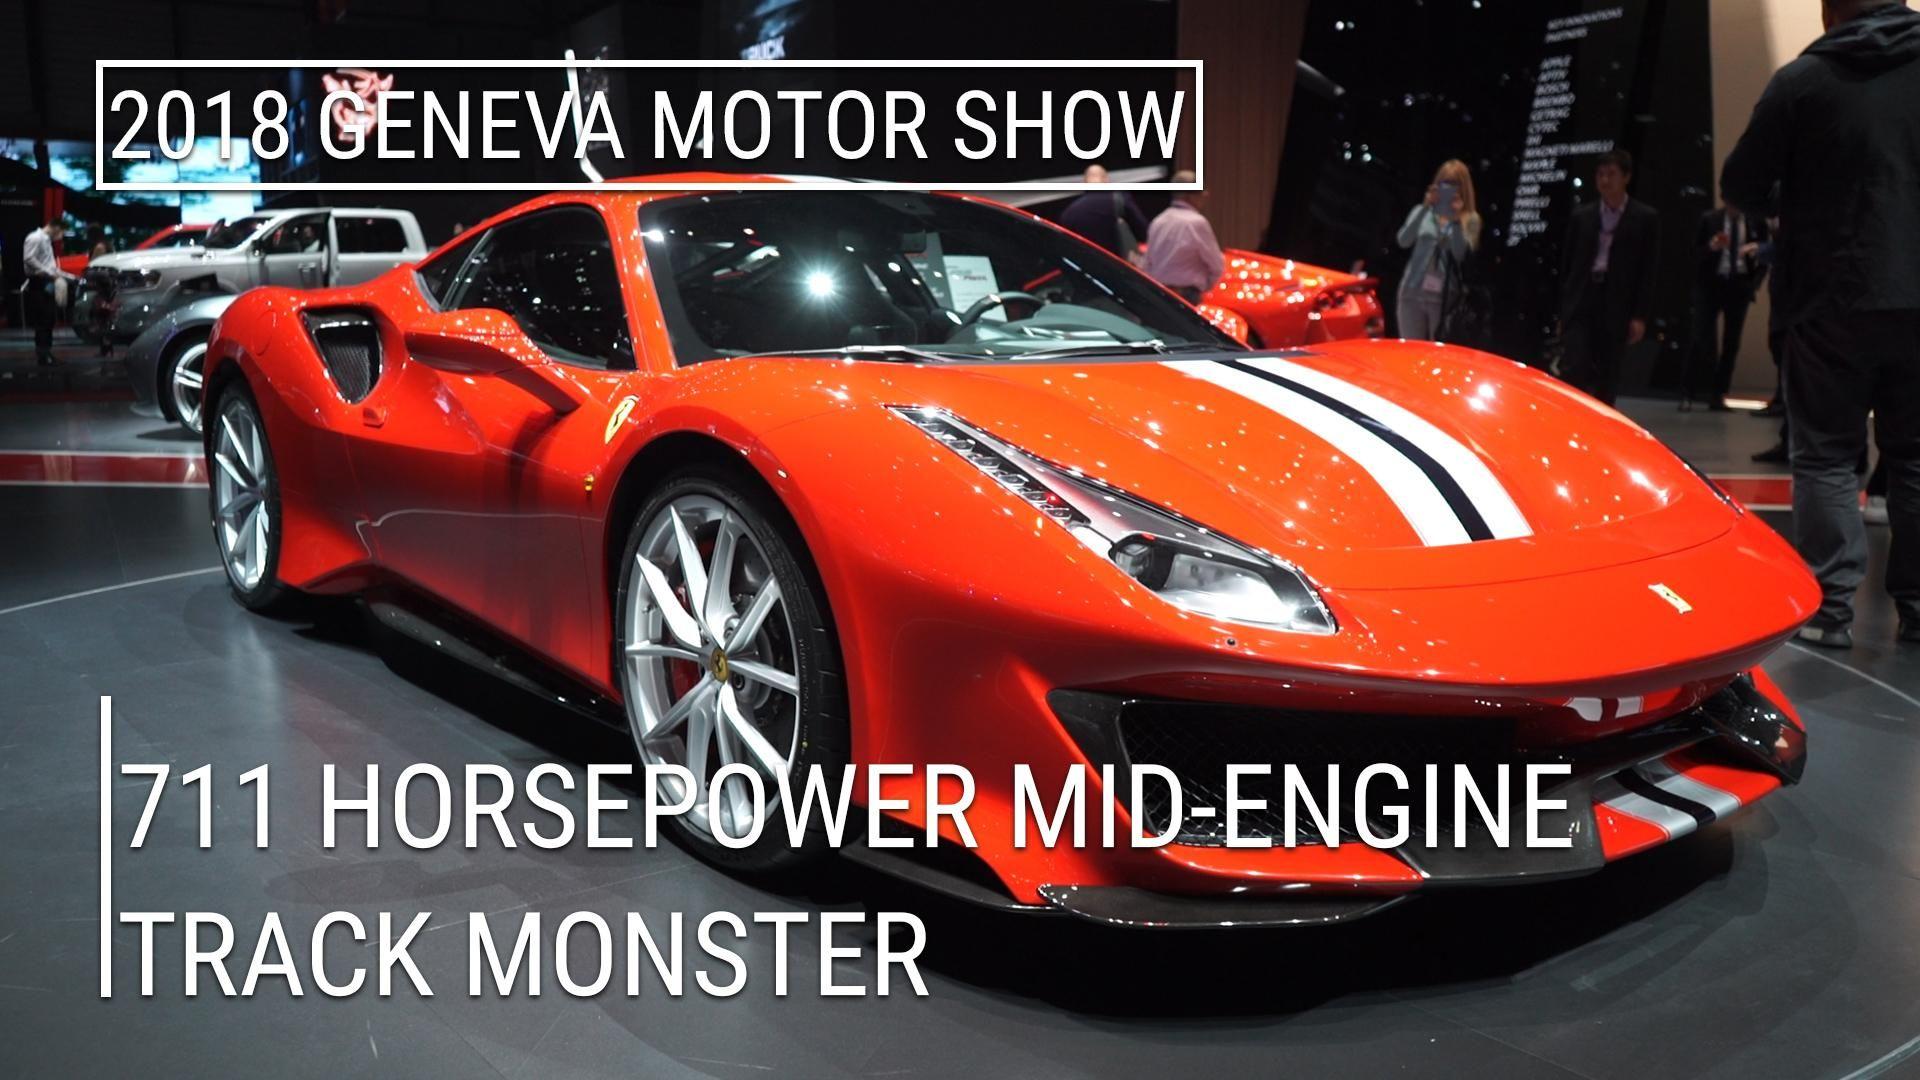 Ferrari To Introduce A V8 Hybrid Supercar This 12 Months Geneva Motor Show Ferrari Super Cars